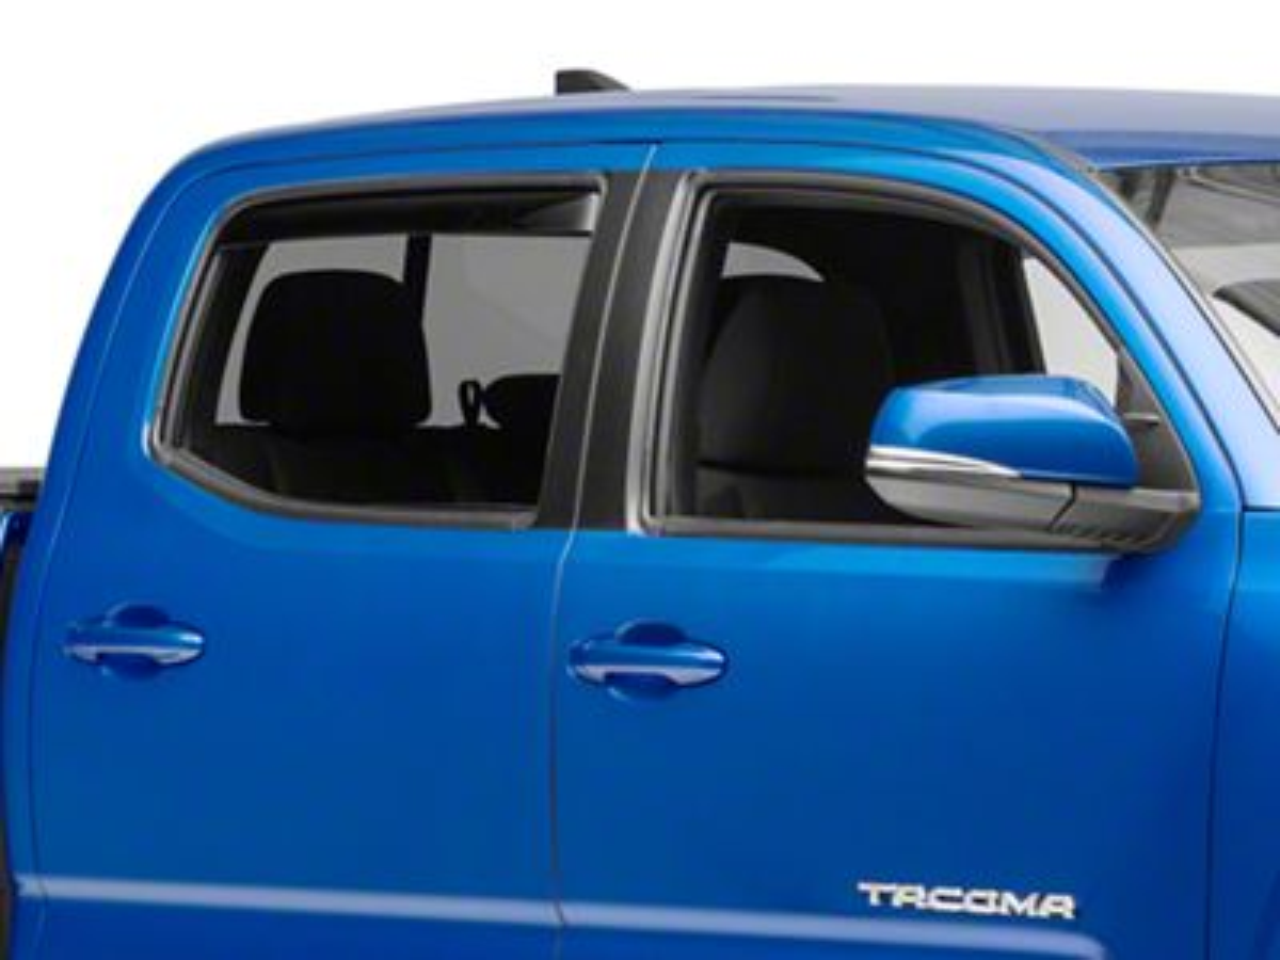 Weathertech Rear Side Window Deflectors - Dark Smoke (16-19 Tacoma Double Cab)